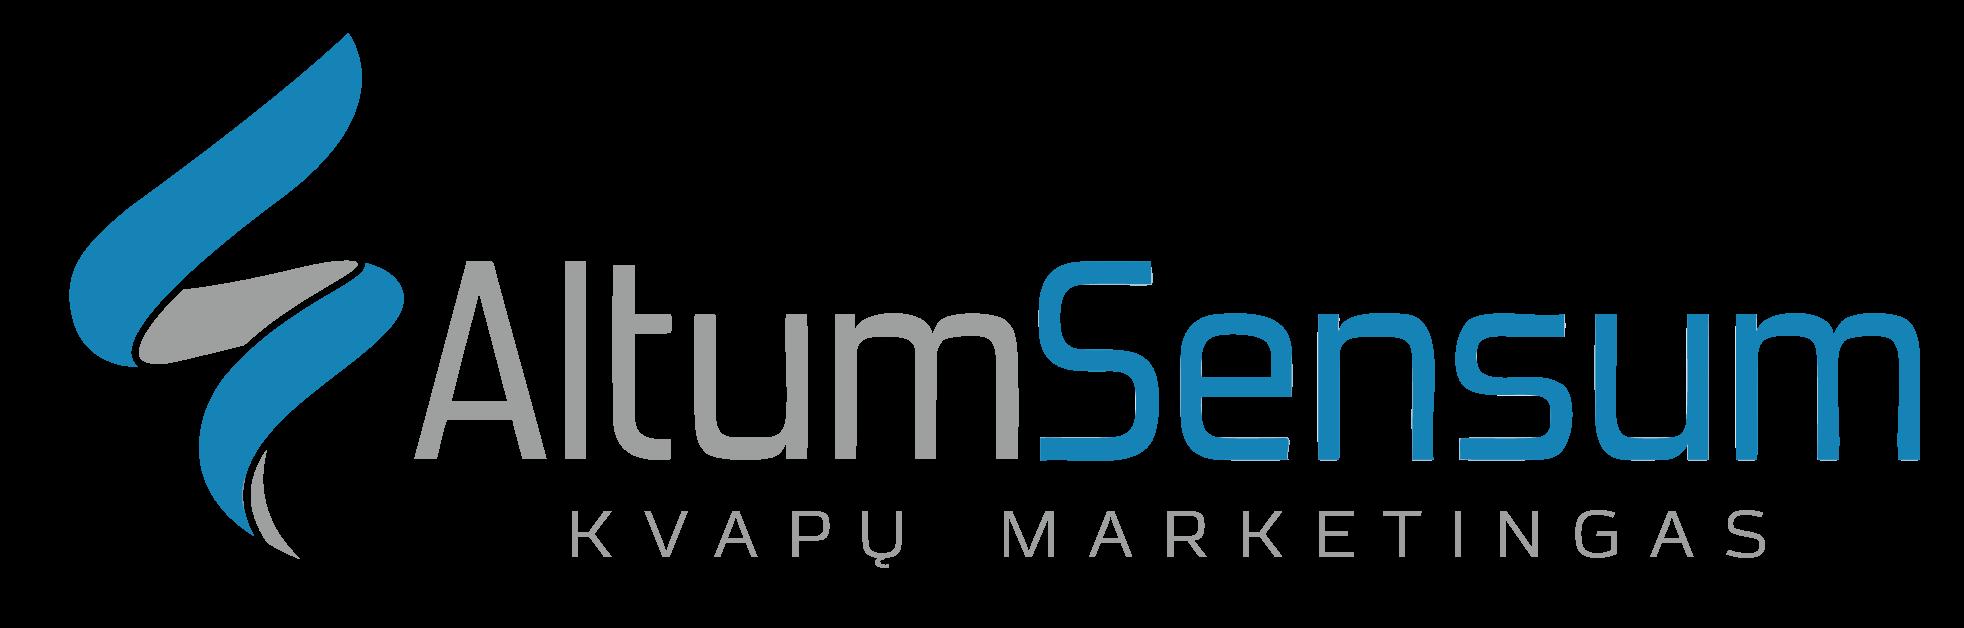 Altum Sensum - Kvapų marketingo sprendimai